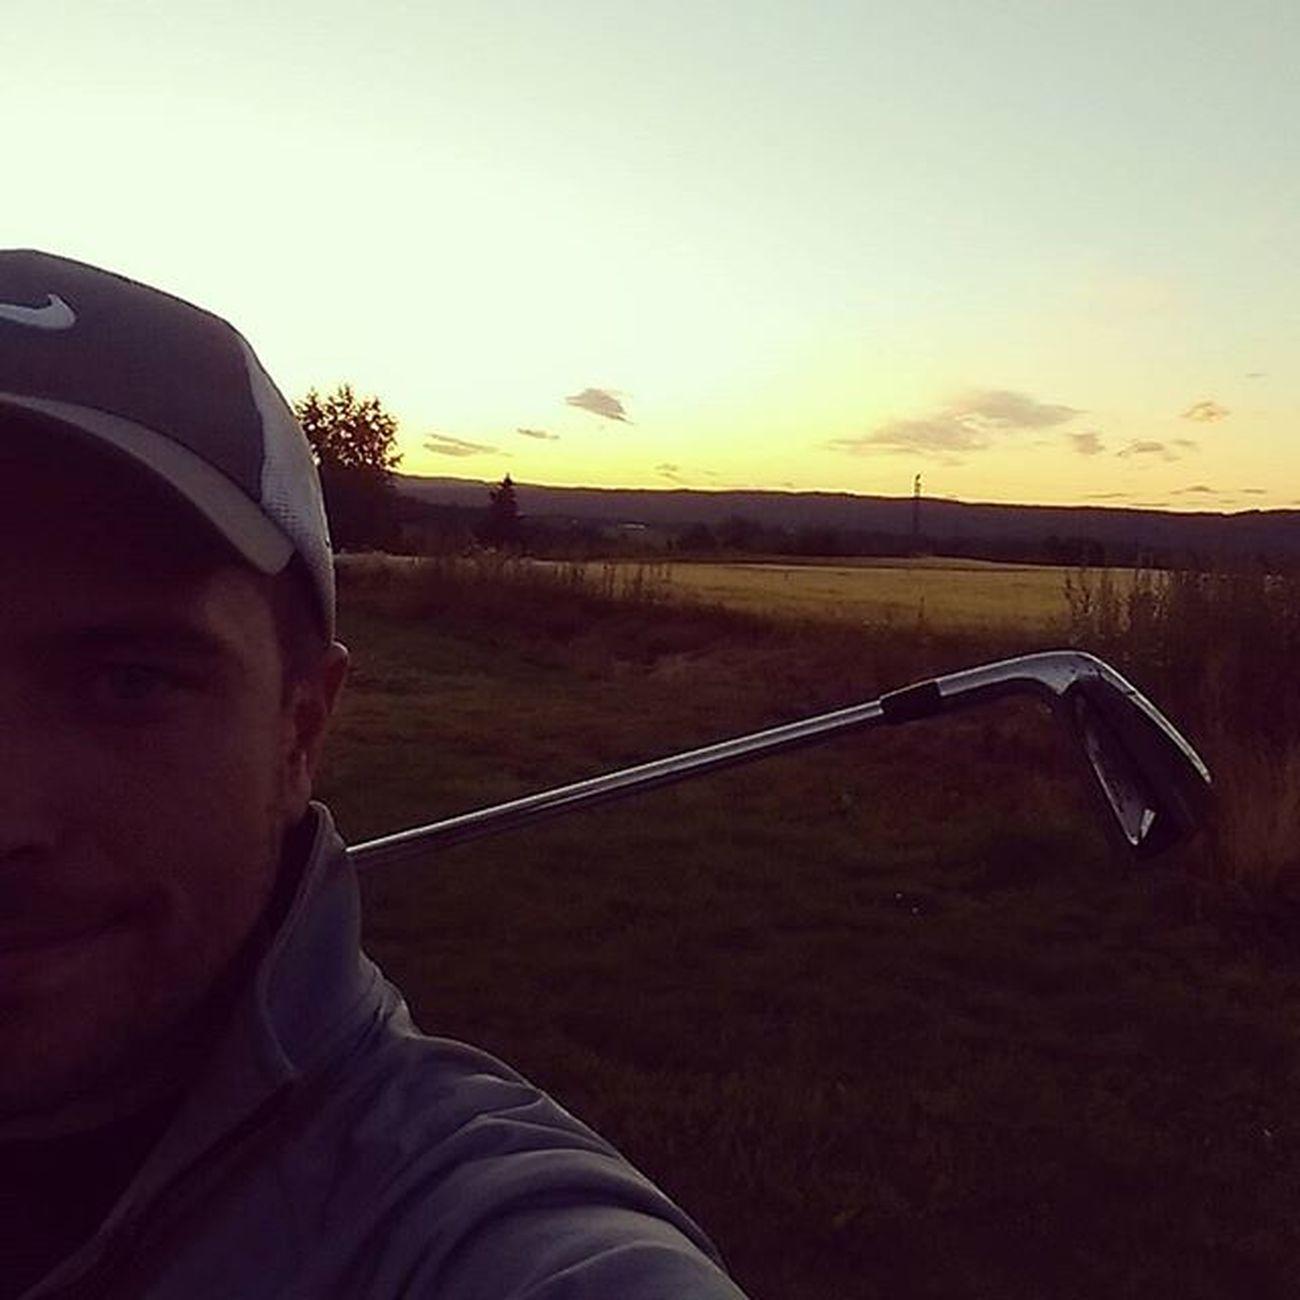 Late evening practice Golfer Golfing Golf Golfie Titleistgolf Titleist Ap2irons Prov1x Nikegolf Nike JustDoIt UnderArmour Underarmourgolf Latepractice Swing Swingpractice Golfpractice Training Evening Sky Nightsky Norway